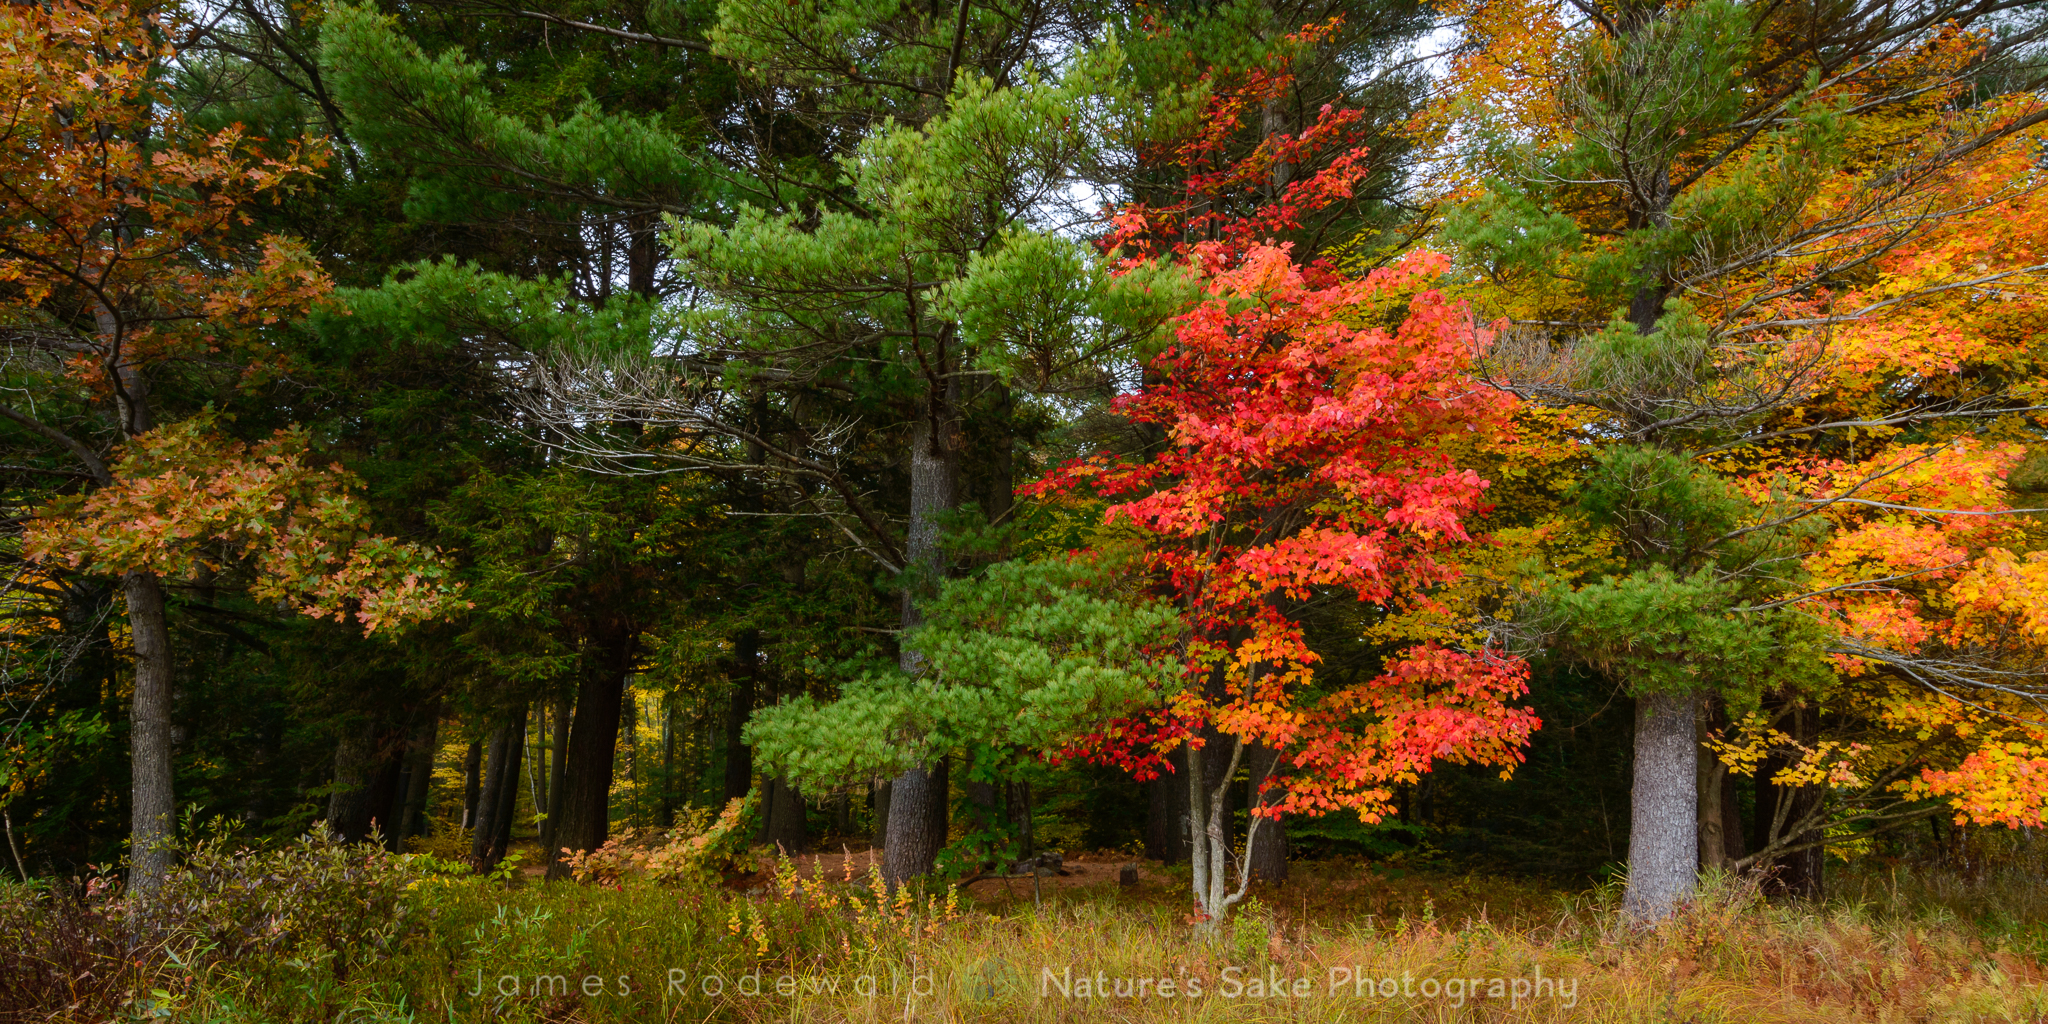 """Adirondack Fall"" to benefit Lake George Land Conservancy"